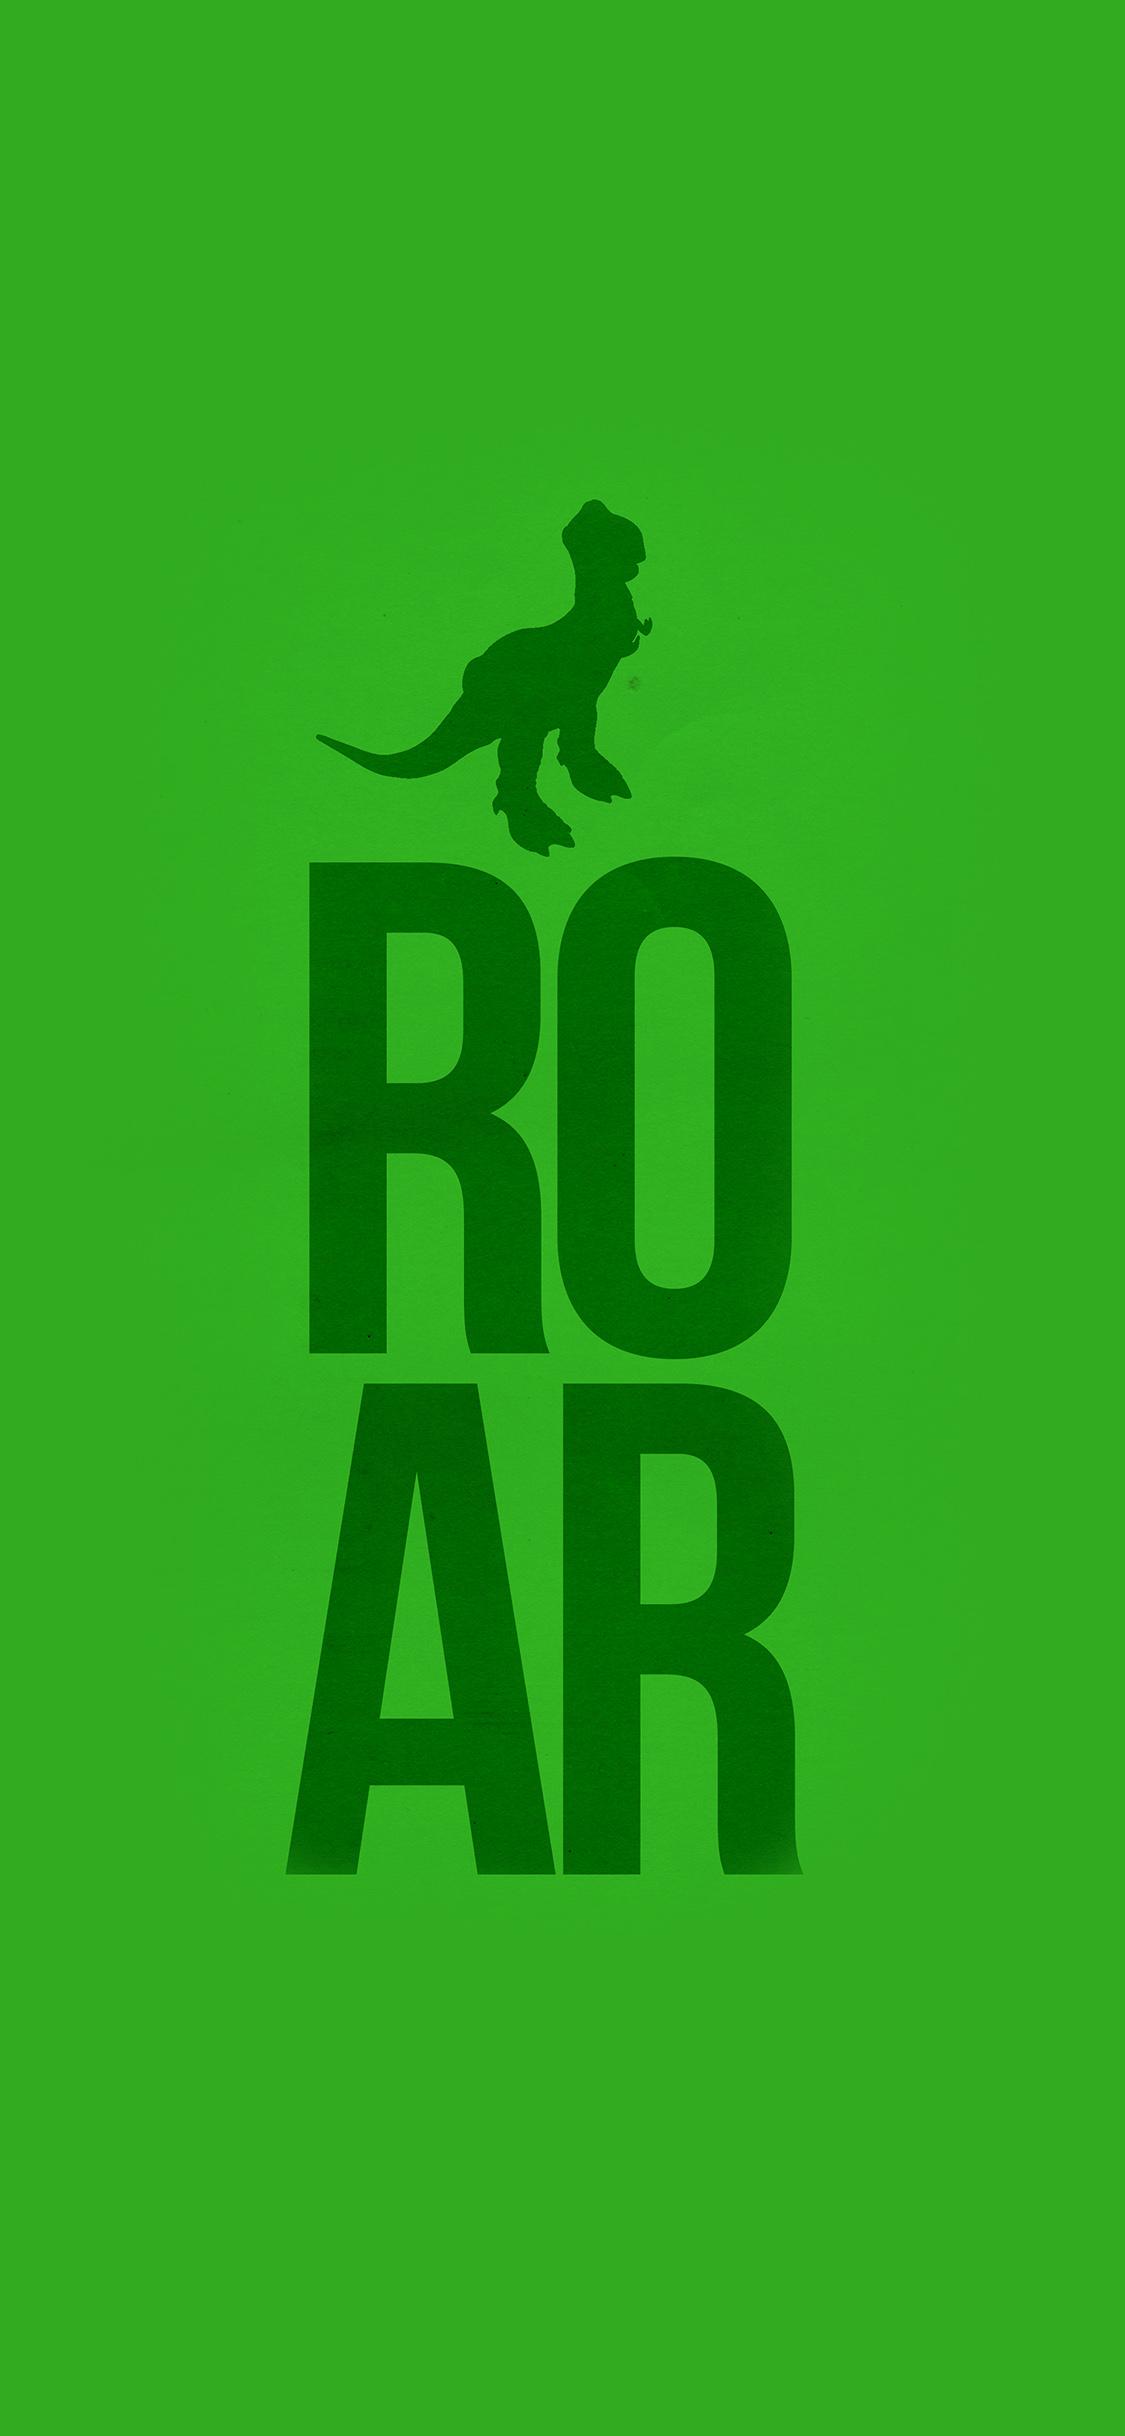 Iphonexpapers Com Iphone X Wallpaper Au61 Roar Toystory Green